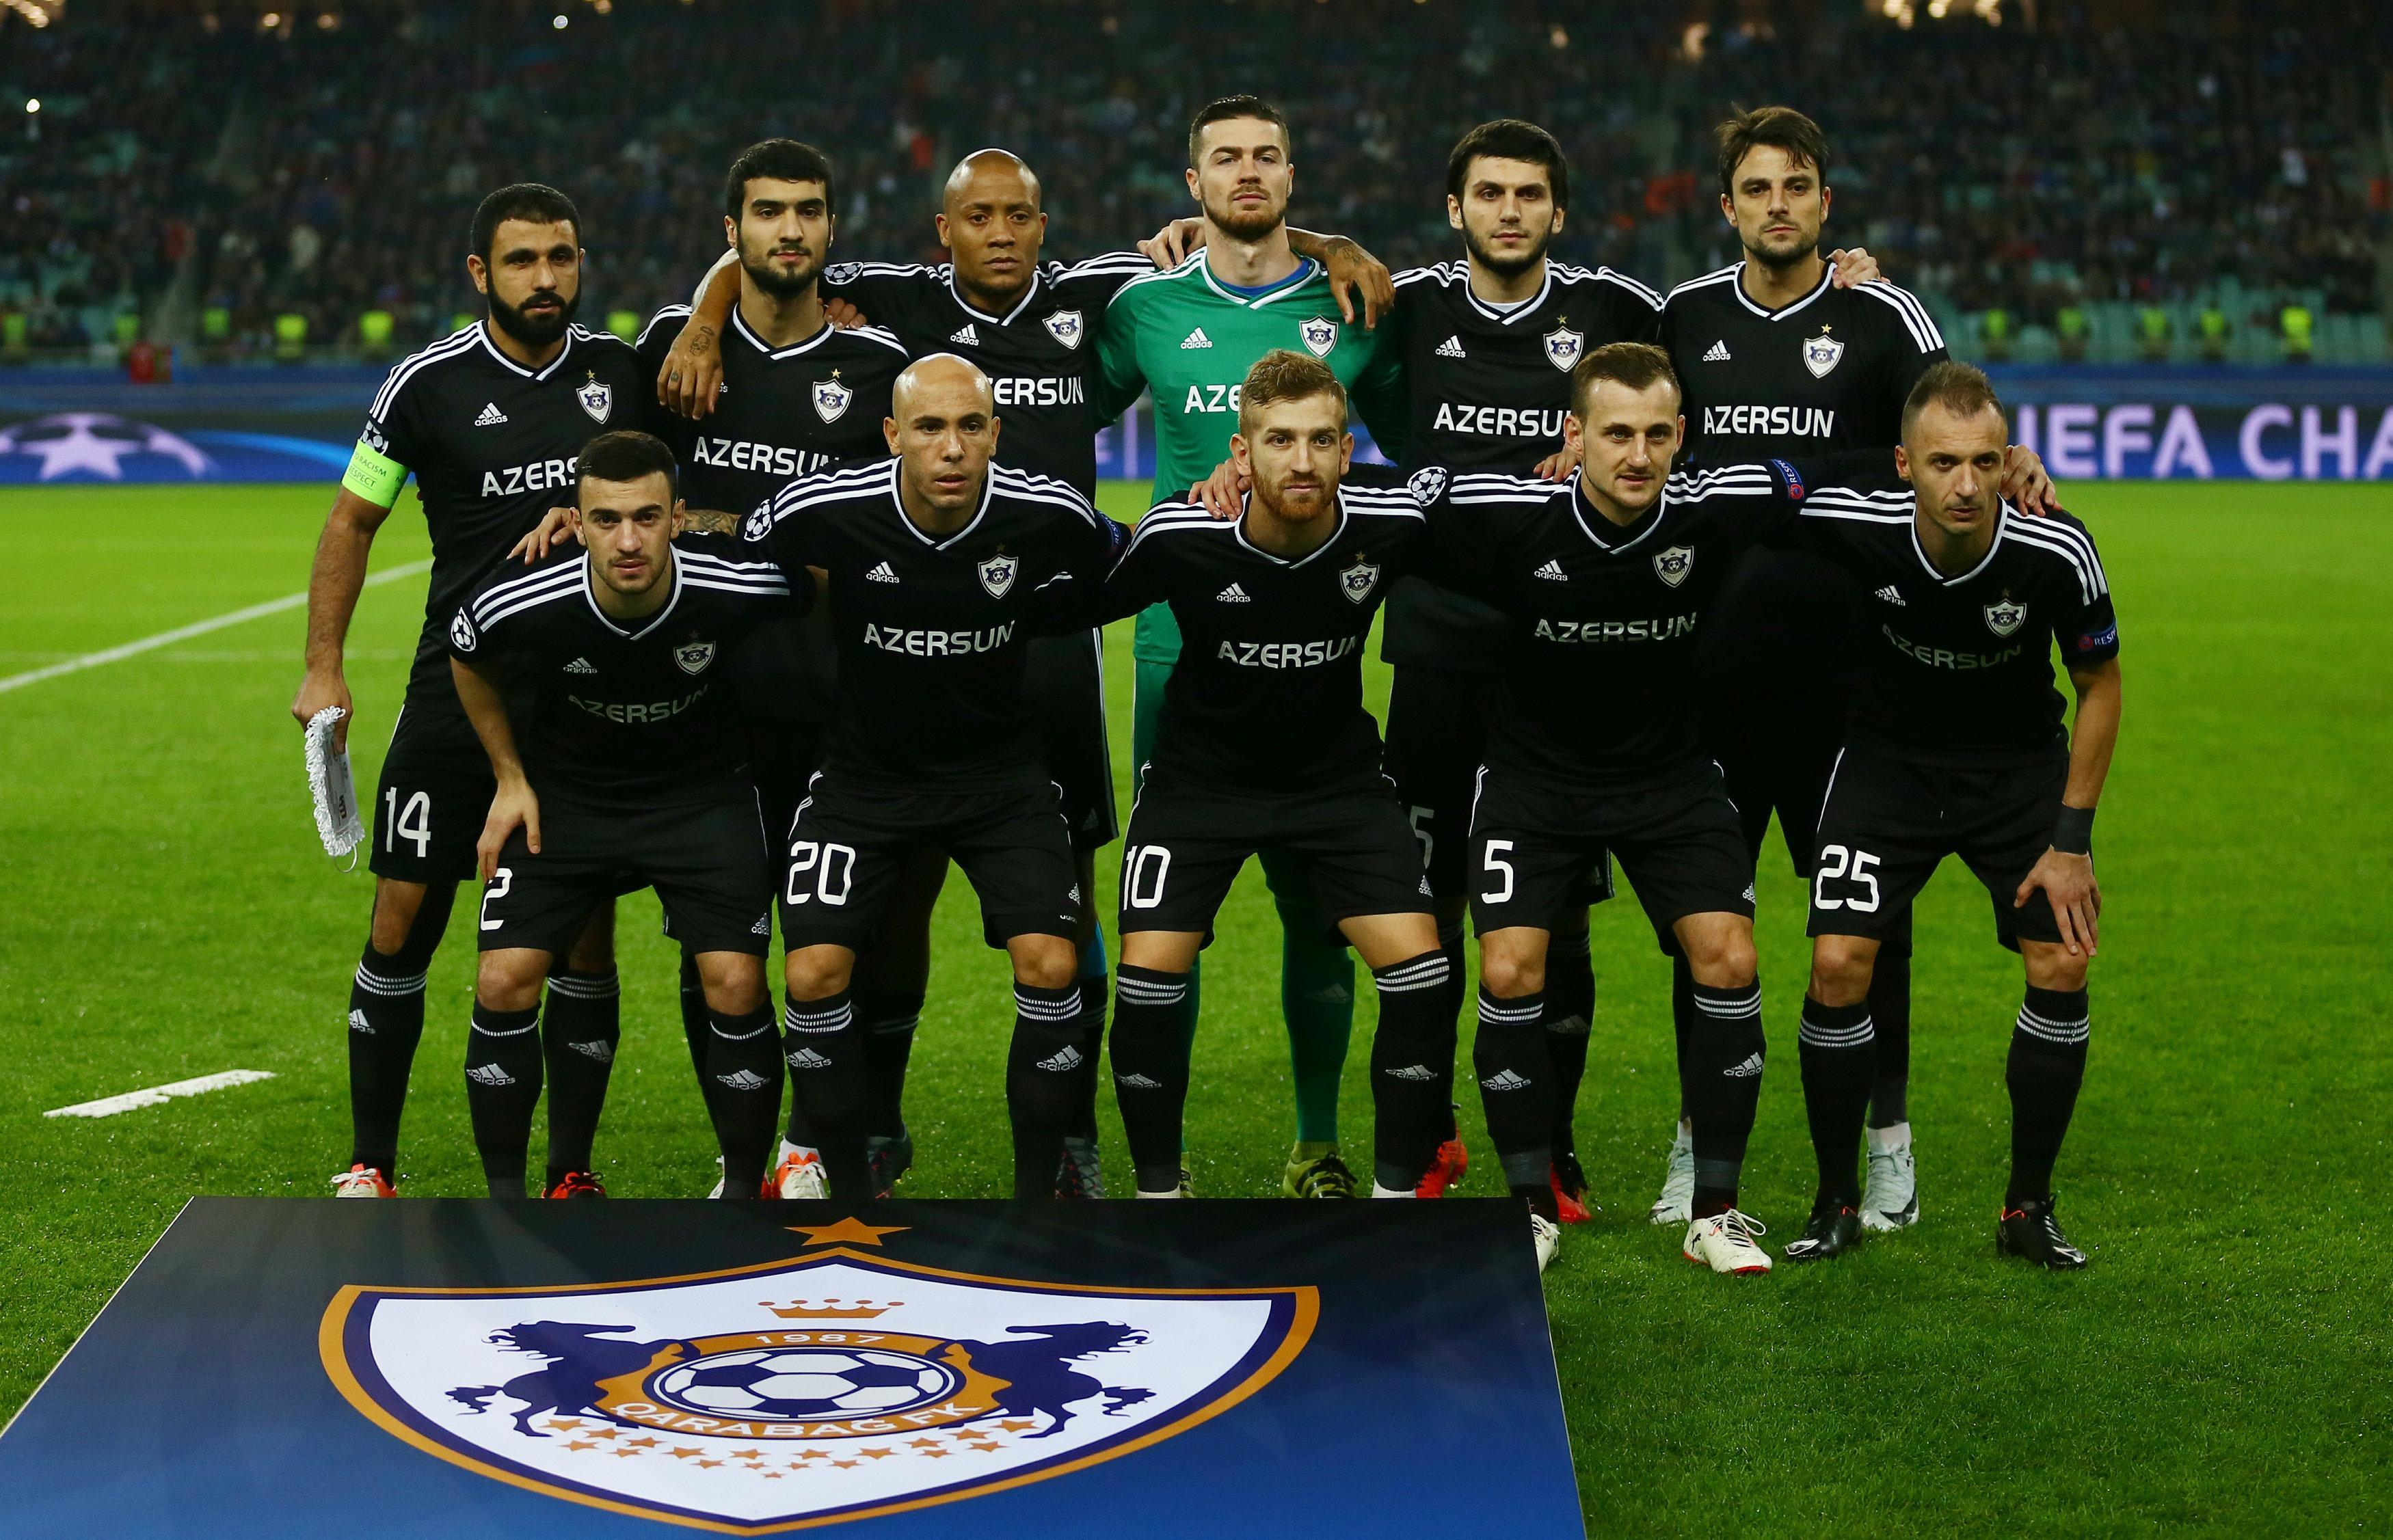 Qarabag faced Chelsea in last season's Champions League